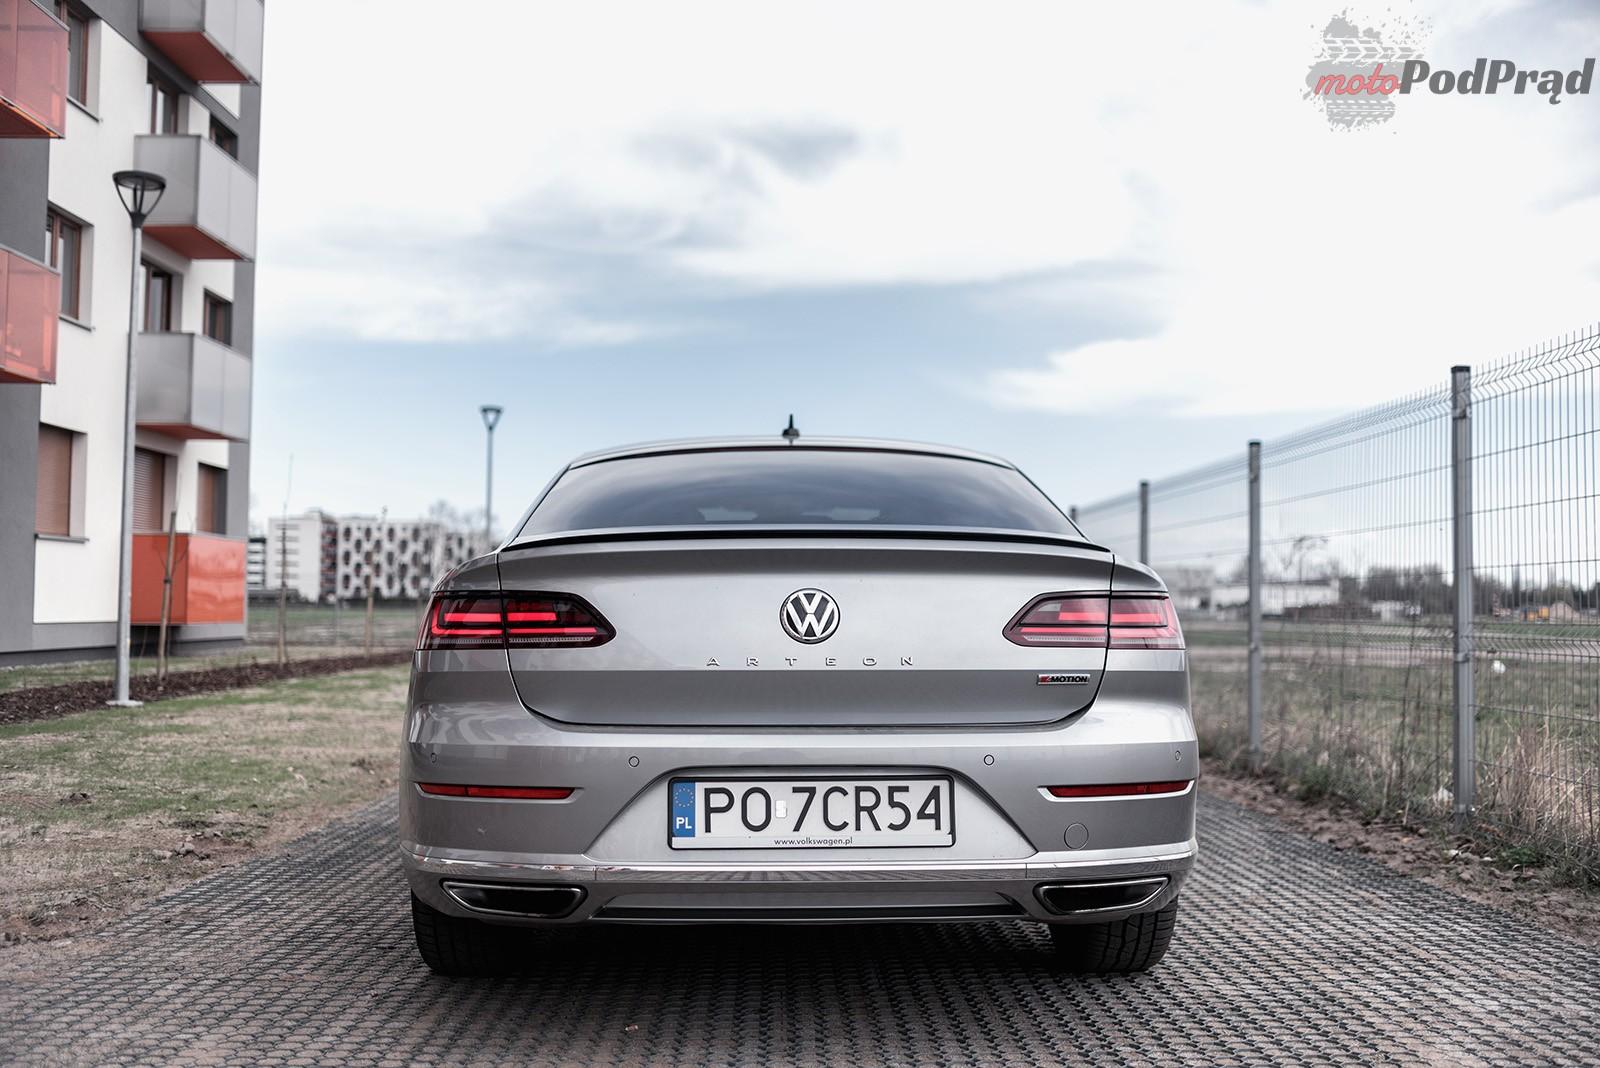 Volkswagen Arteon12 Test: Volkswagen Arteon 2.0 TSI 280 KM   udana metamorfoza